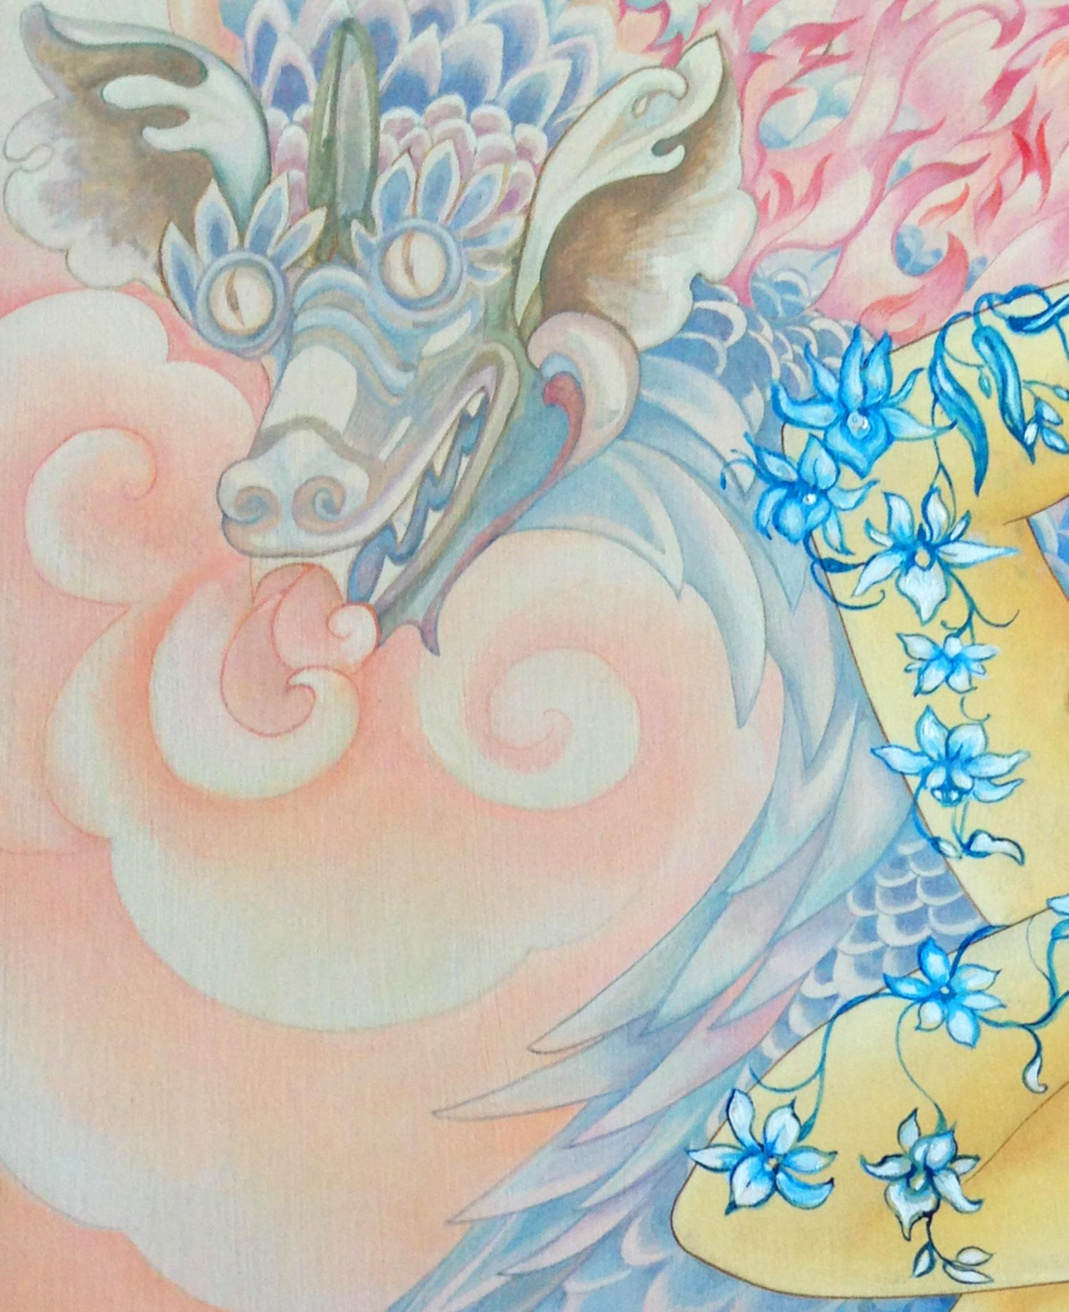 Mara Tranlong - Belle au dragon détail 2